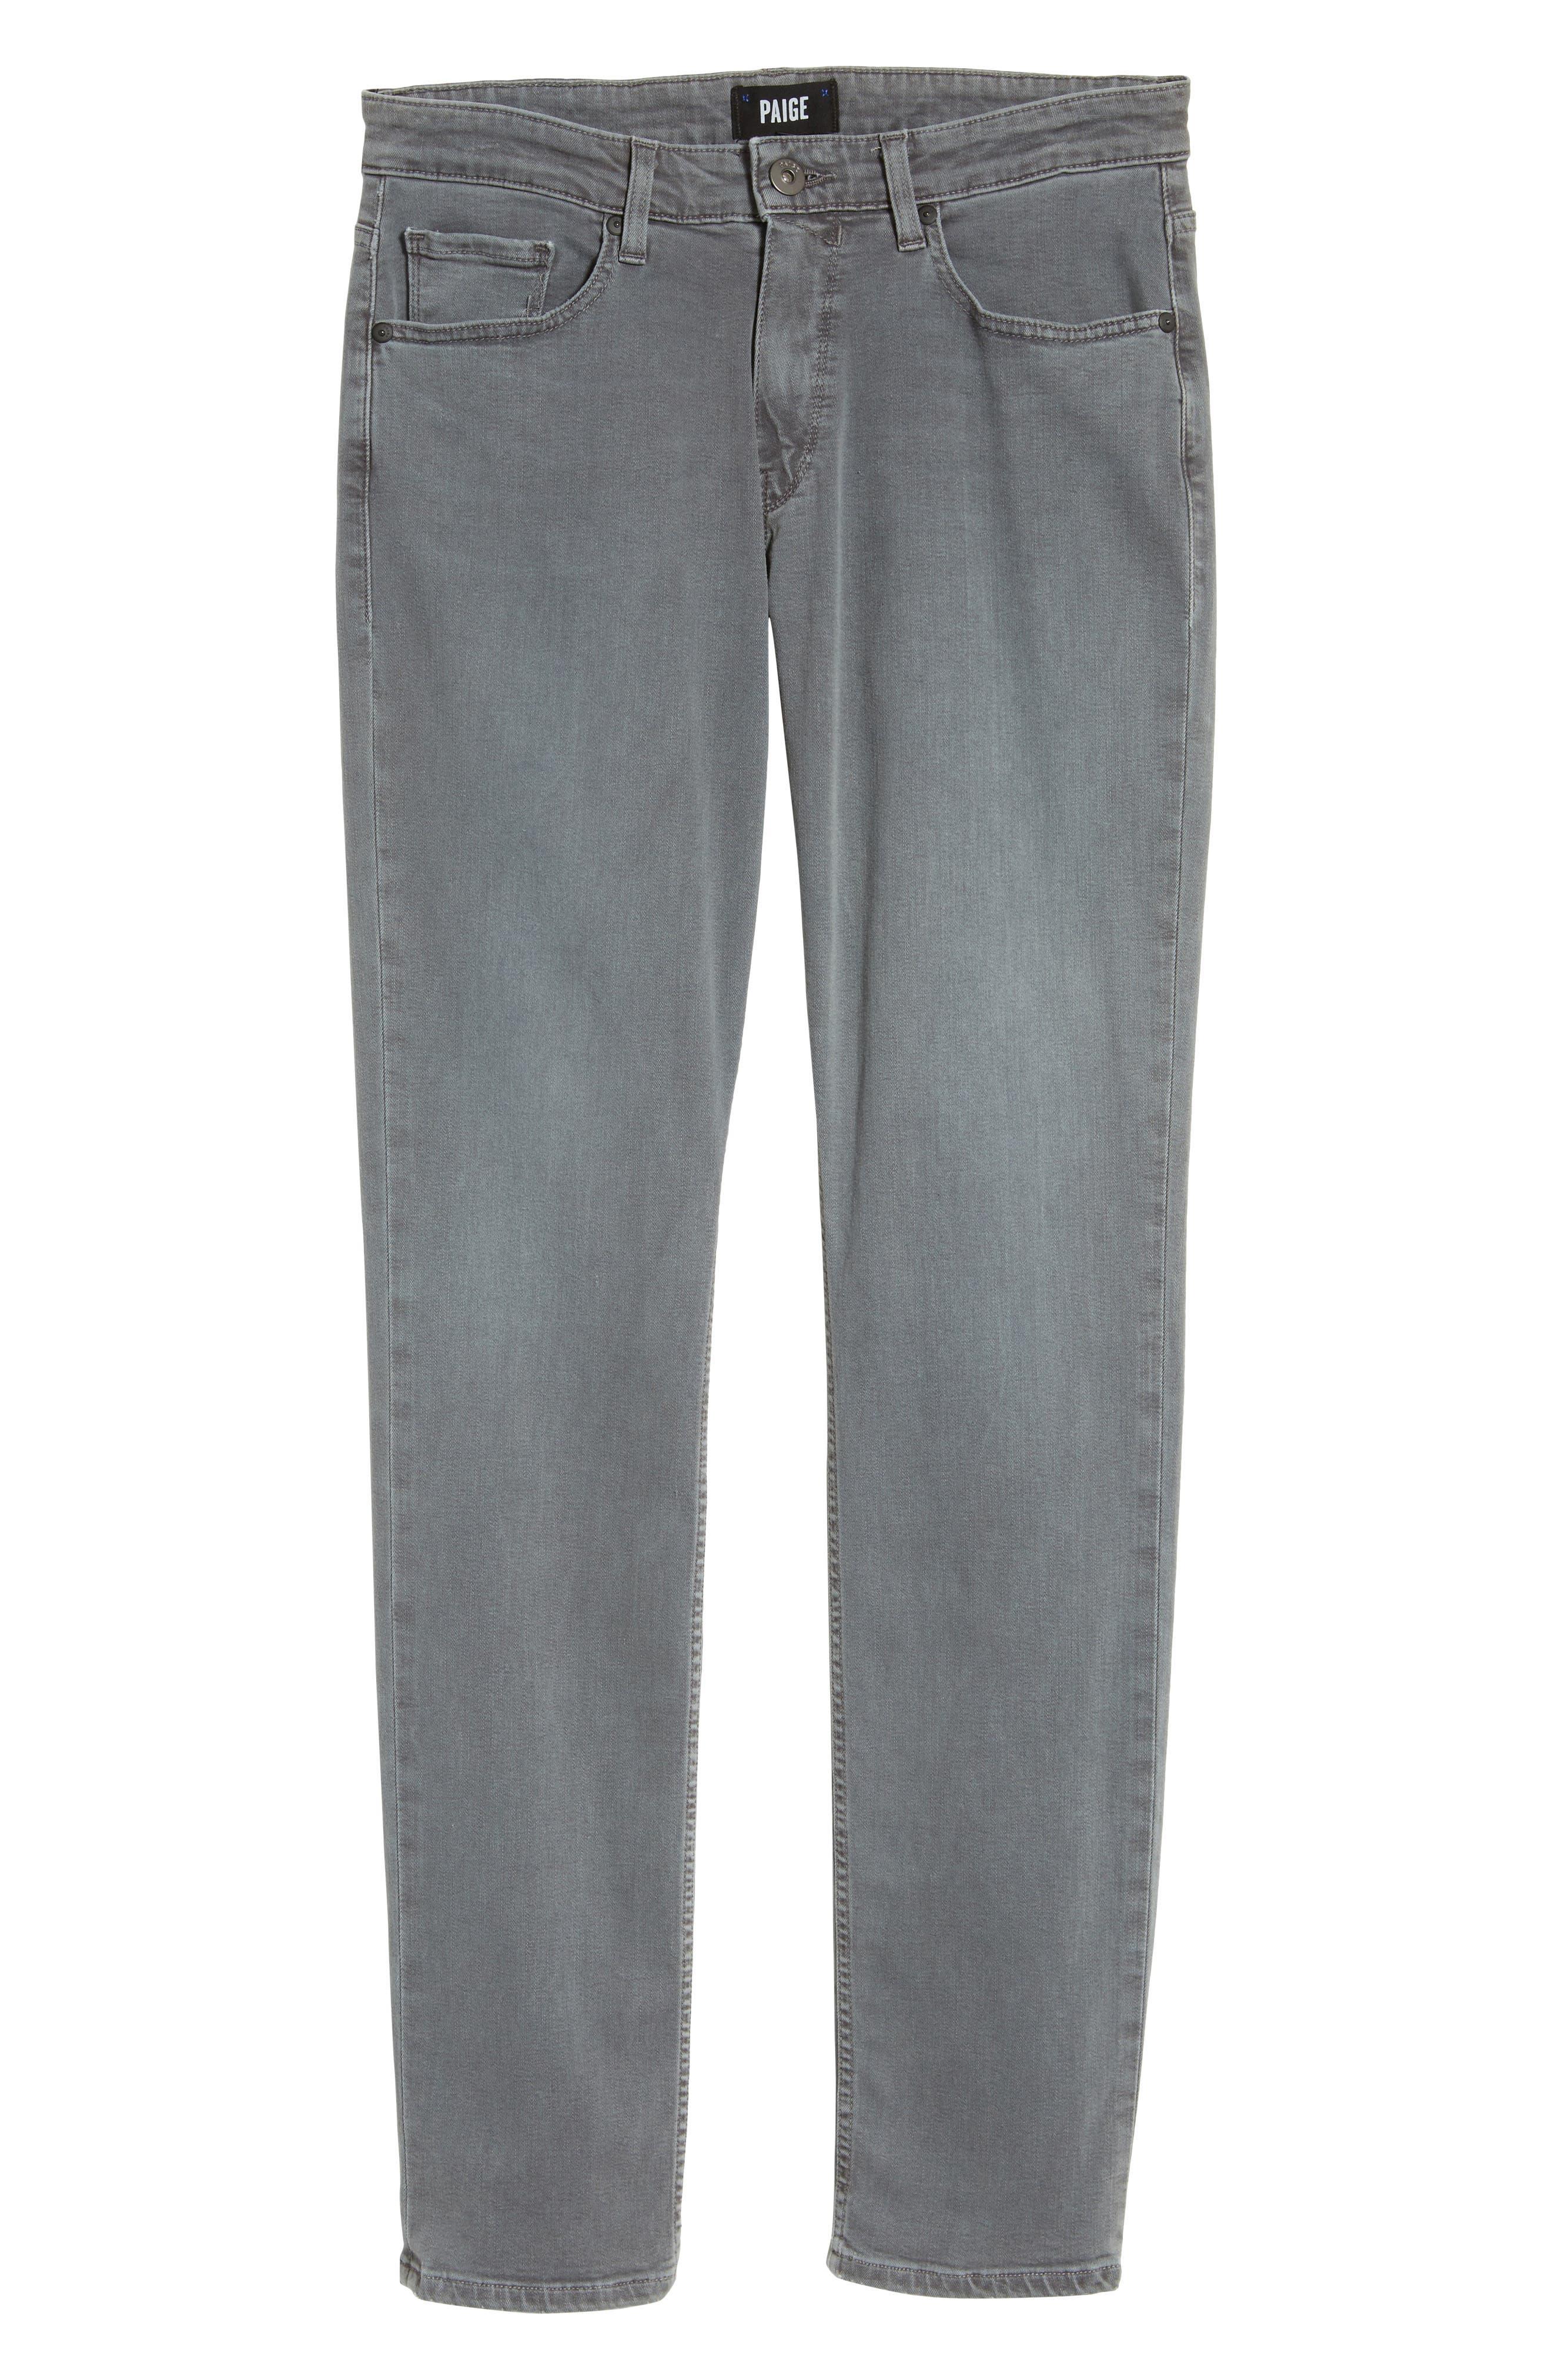 Transcend - Lennox Slim Fit Jeans,                             Alternate thumbnail 6, color,                             020